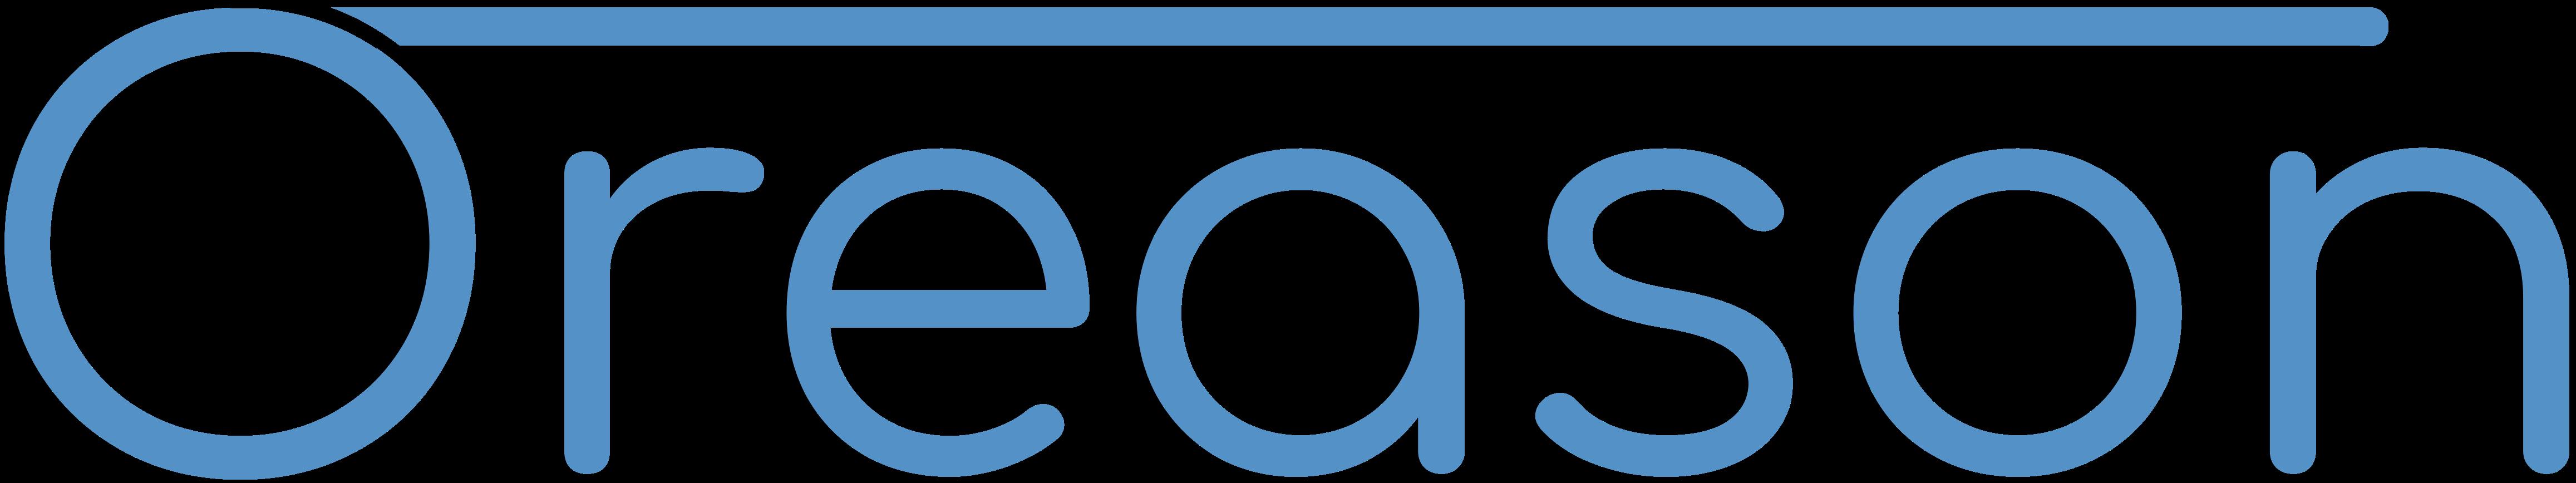 Oreason